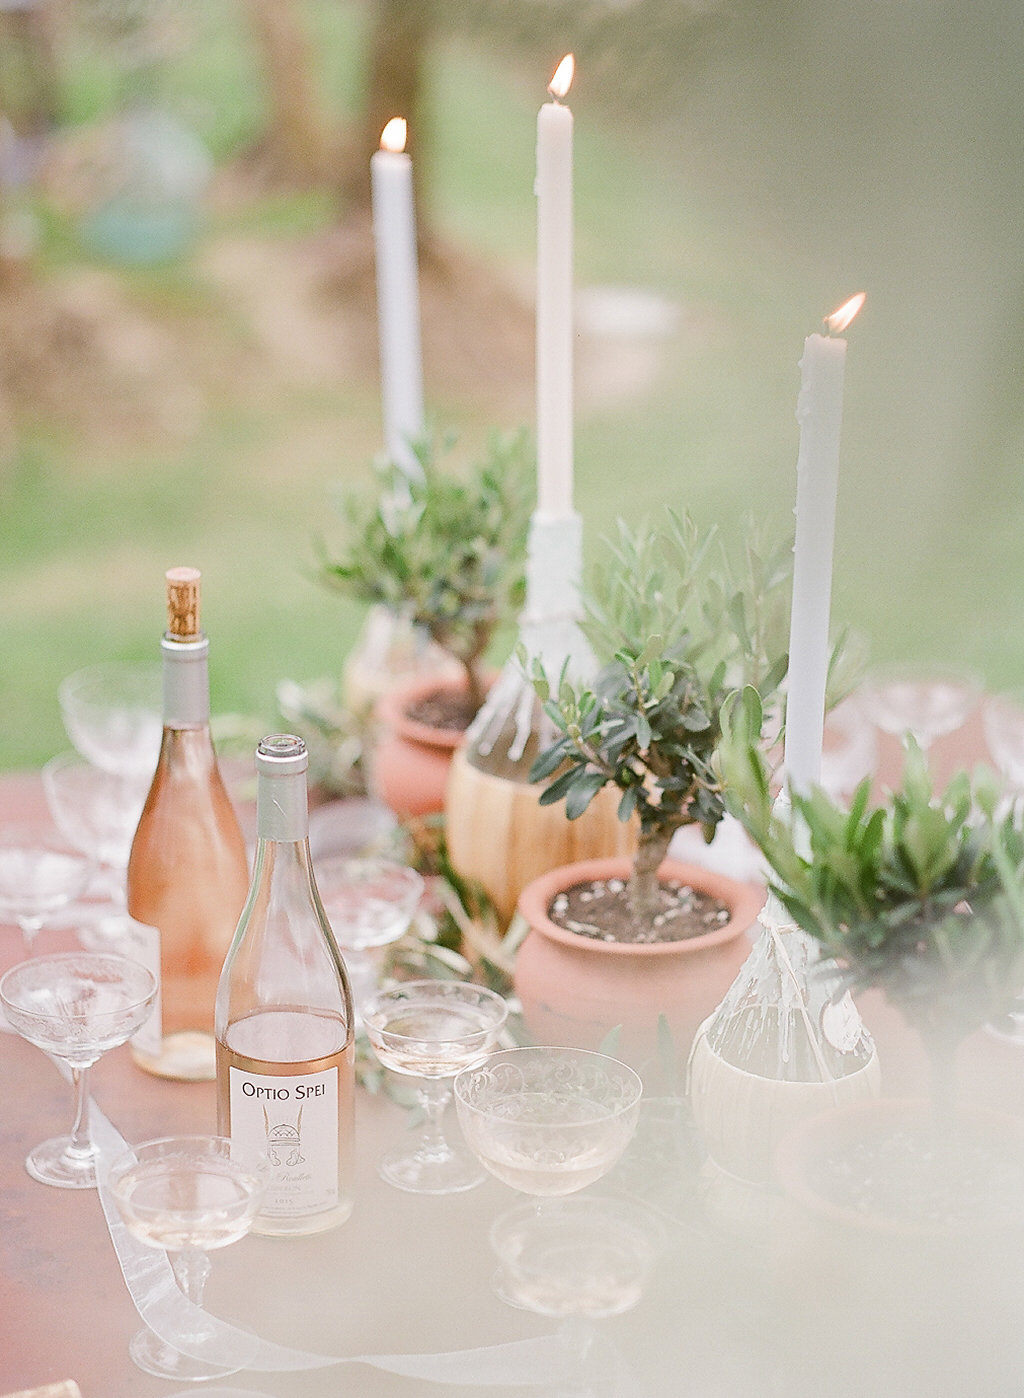 le coeur dans les etoiles - wedding planner - provence - luberon - alpilles - drome - vaucluse - sardaigne - italie - organisation - mariage - shooting - dolce vita - valery villard-352